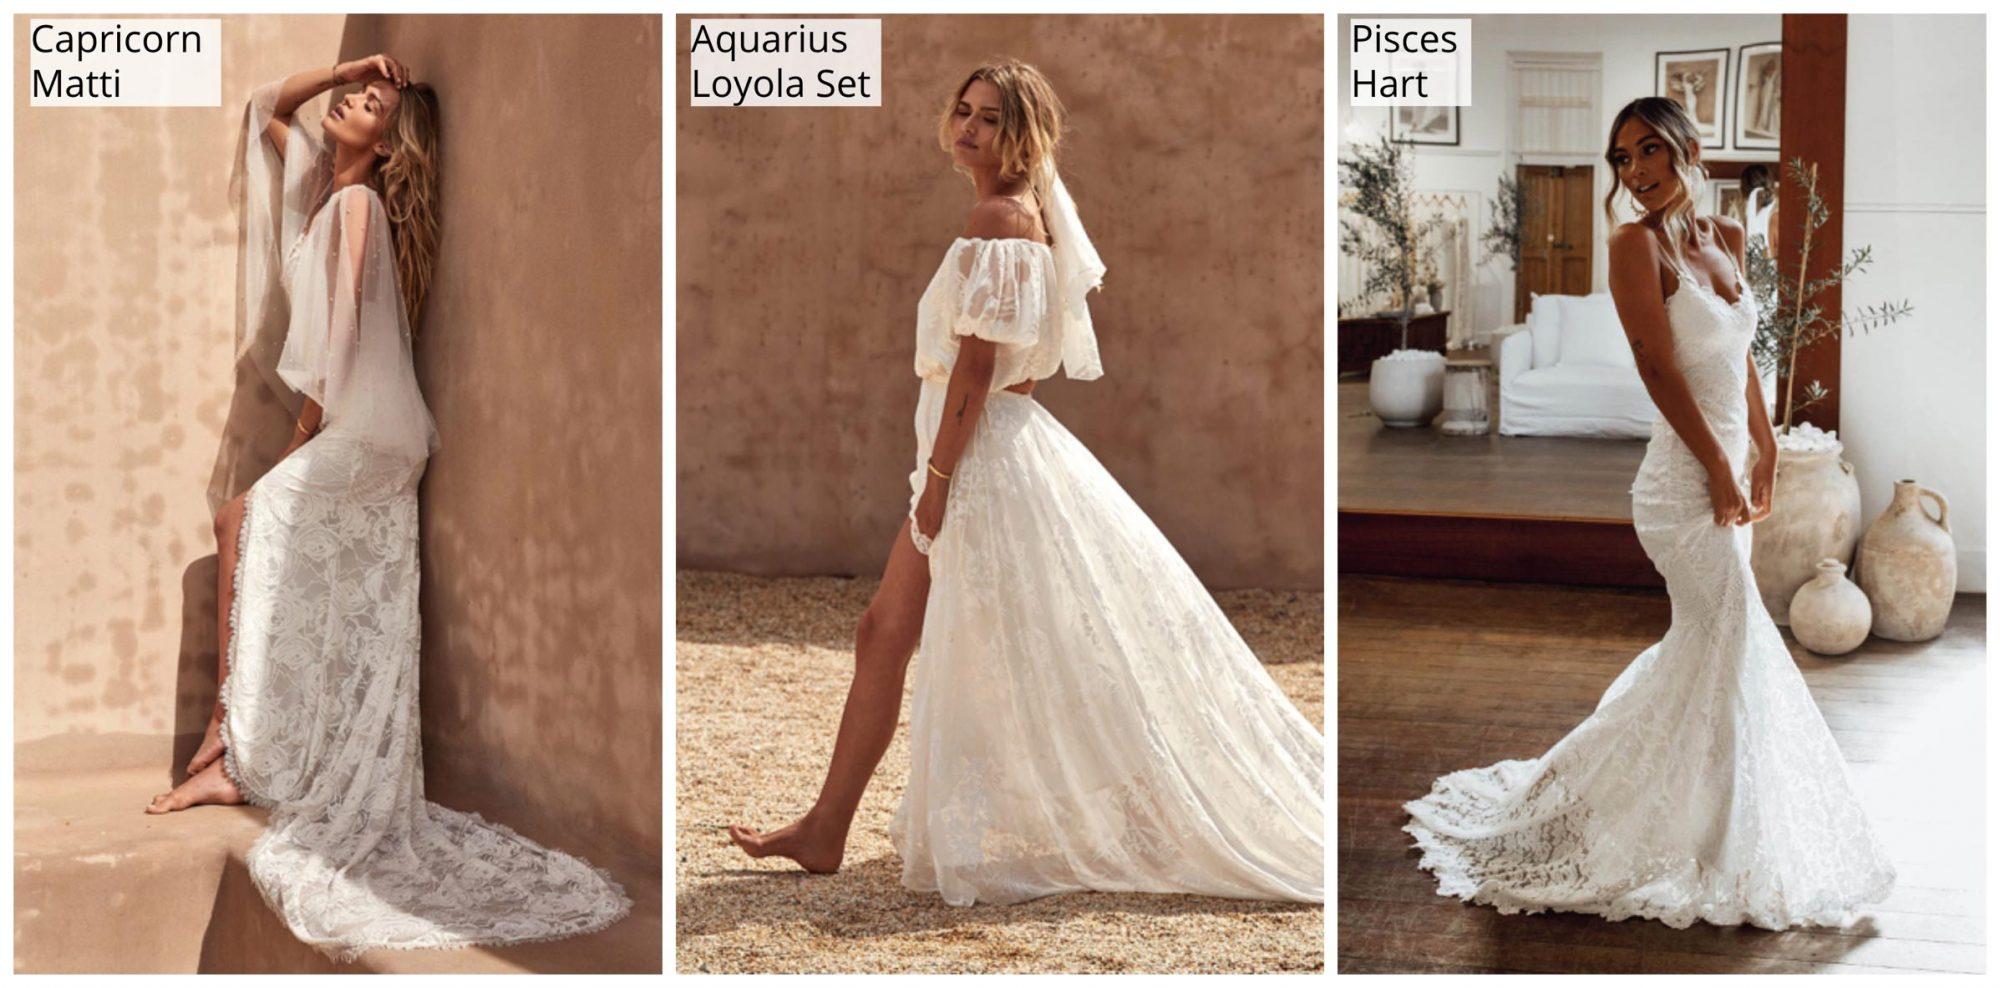 Dress for your zodiac: Capricorn Aquarius Pisces